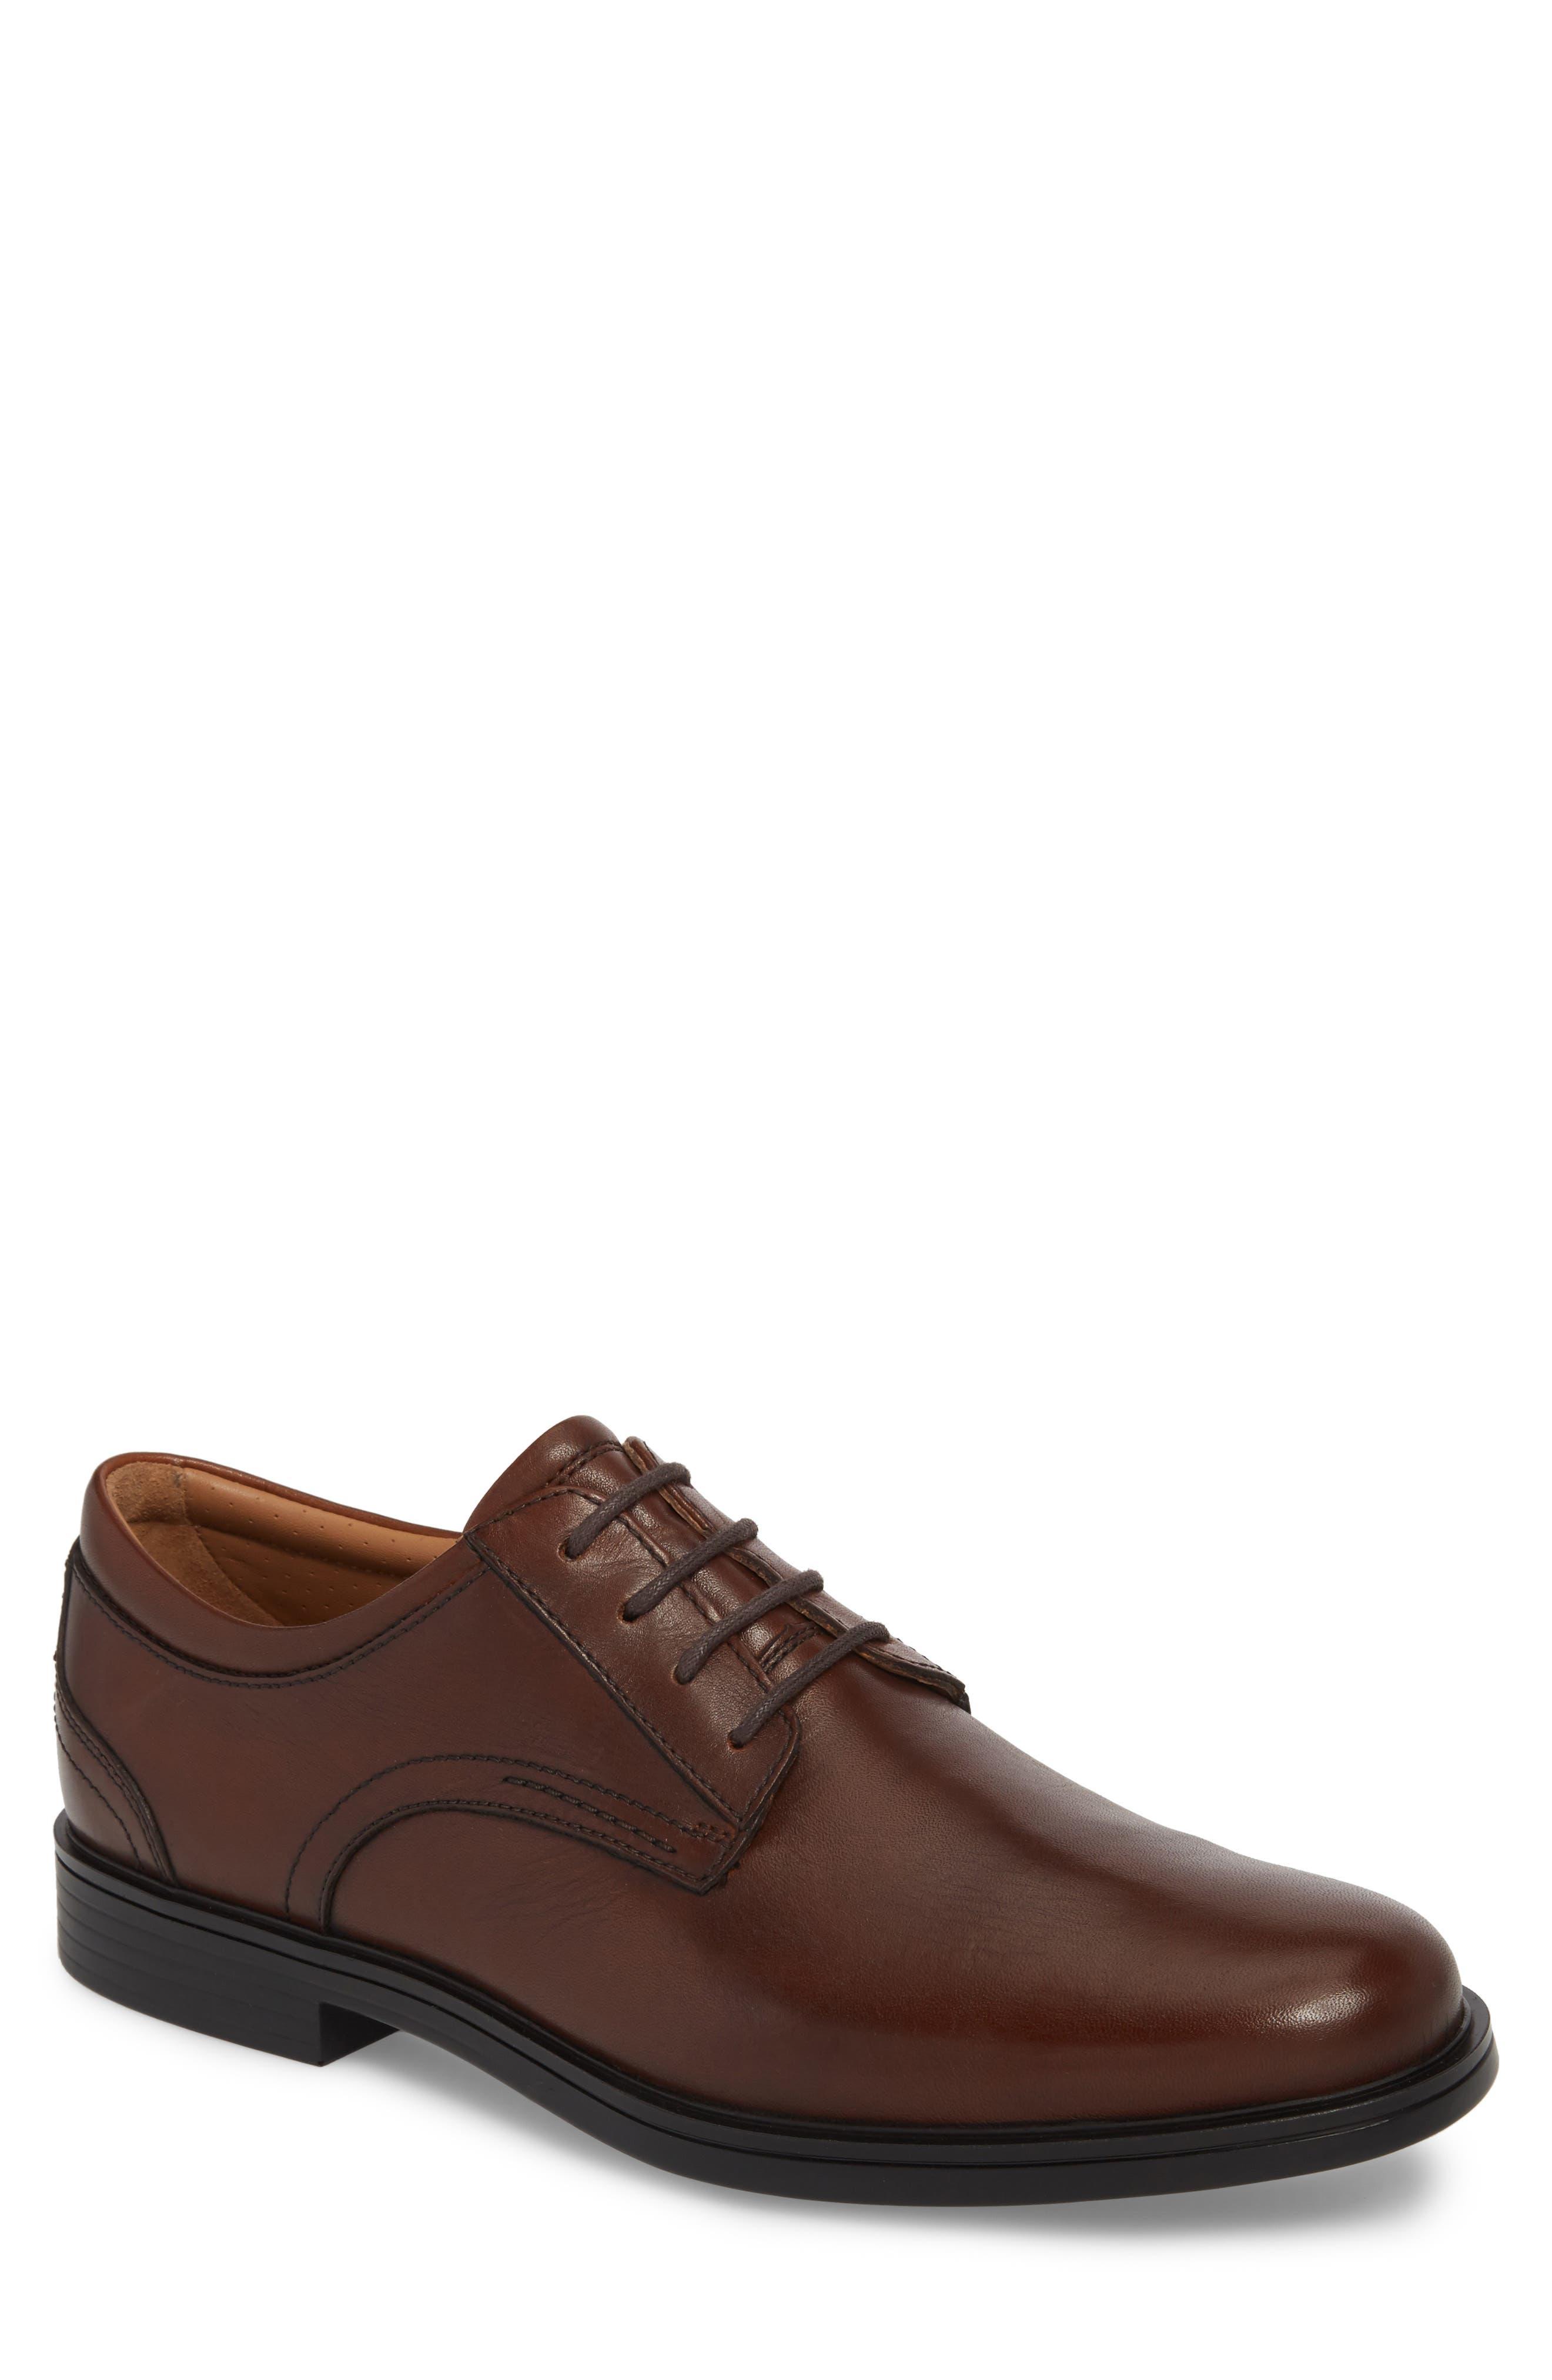 Unaldric Plain Toe Derby,                         Main,                         color, Dark Tan Leather